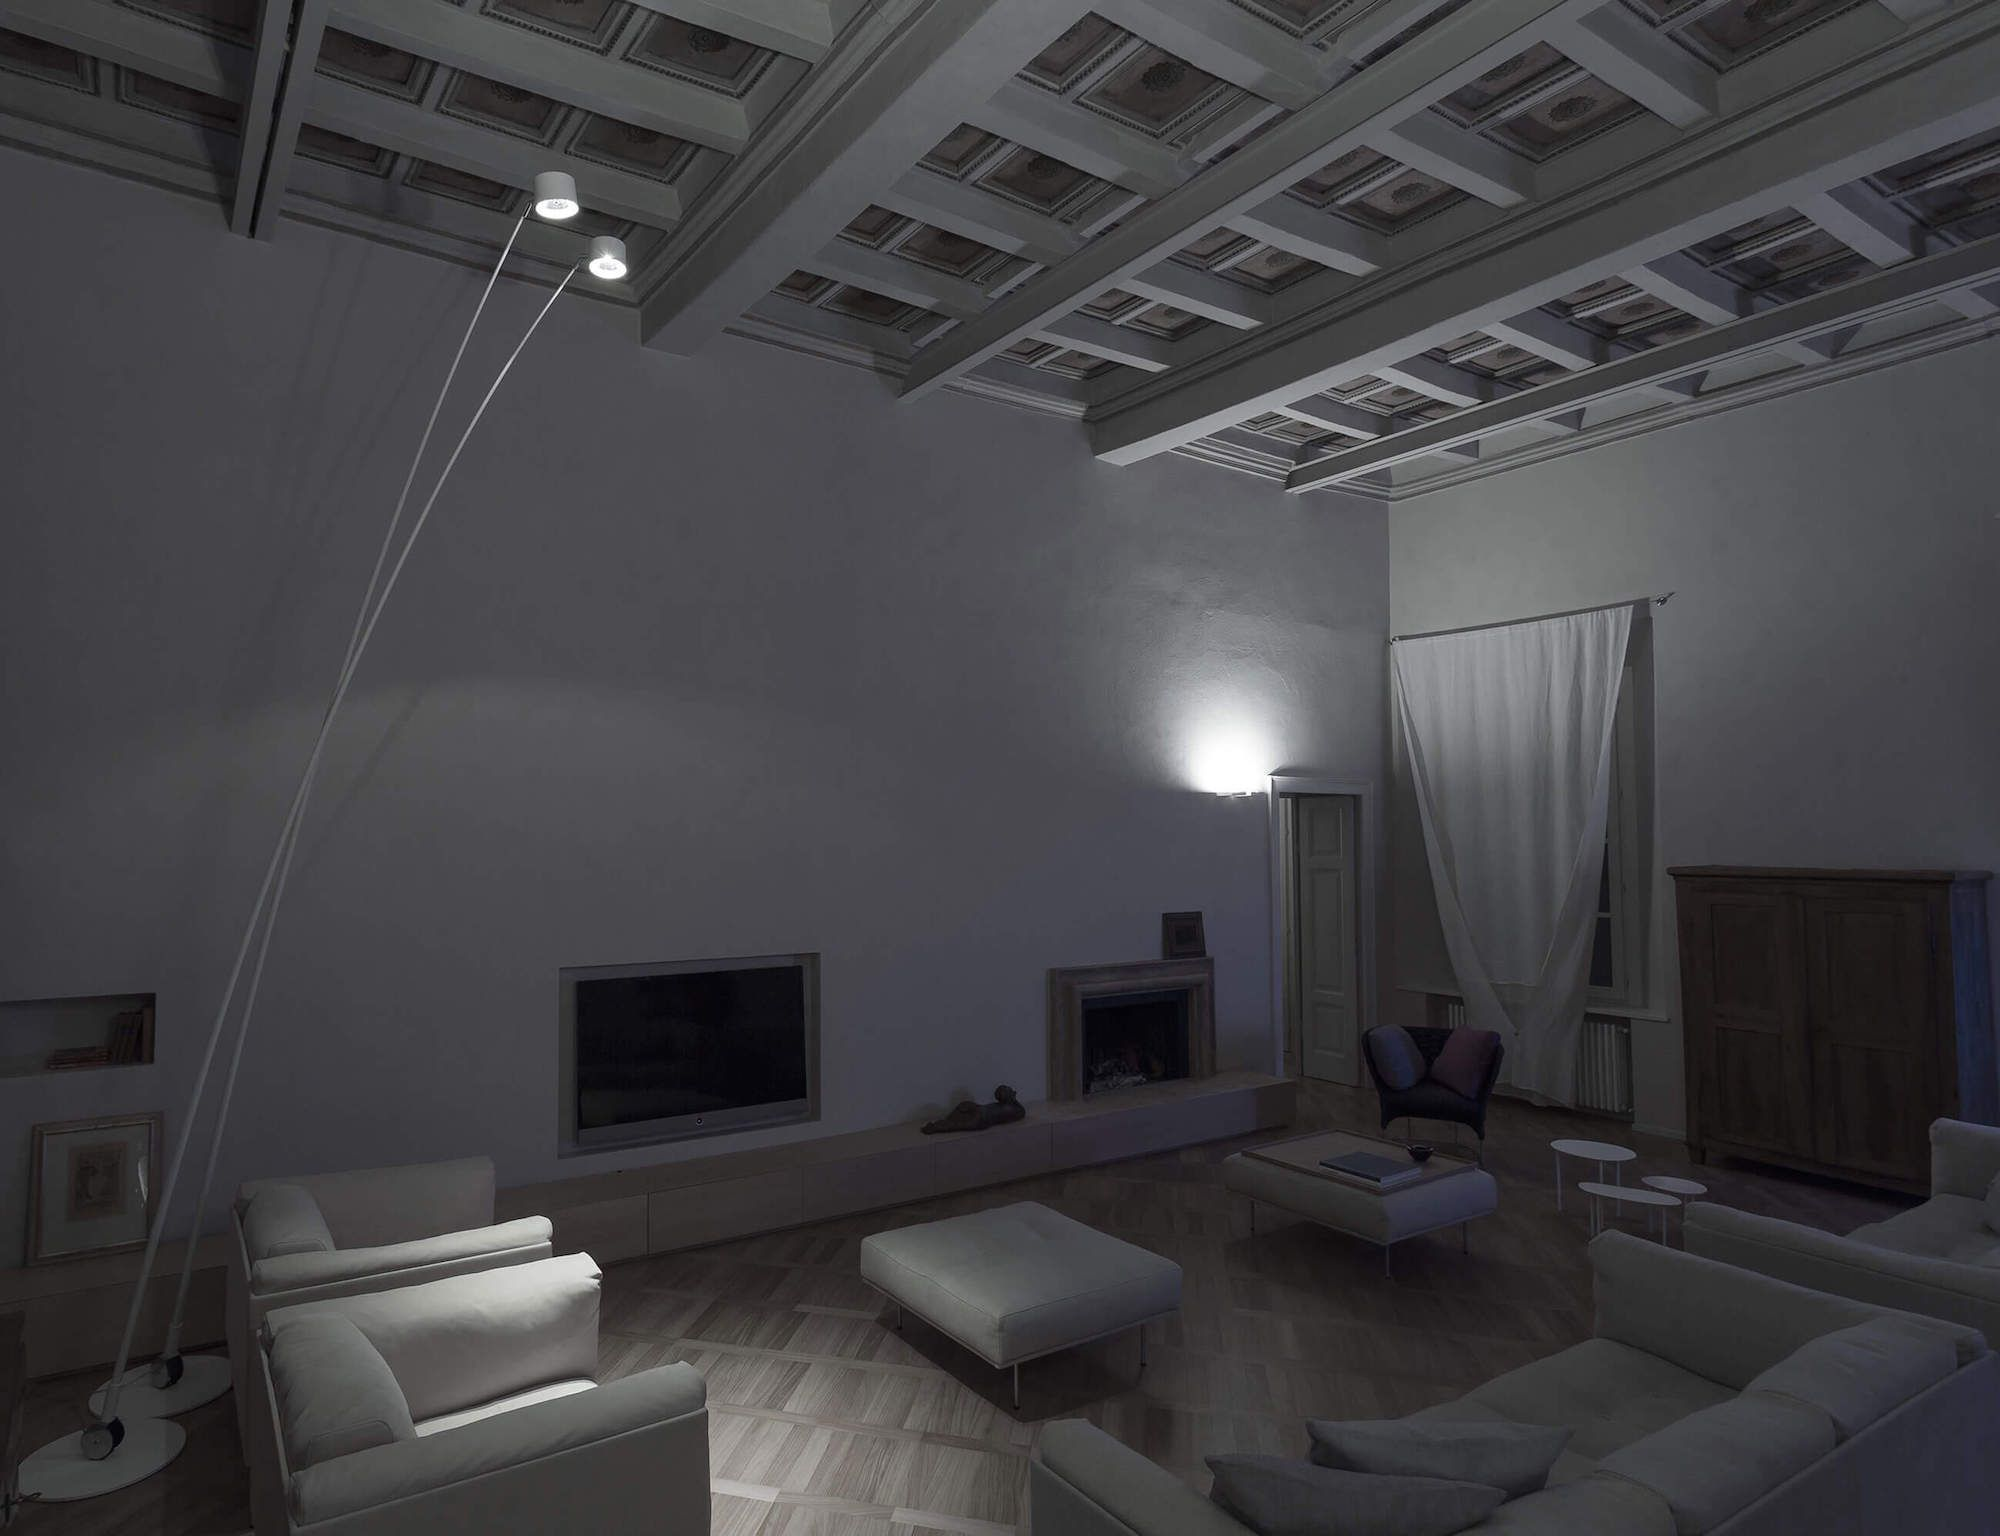 apartment-piacenza-studio-blesi-subitoni-15